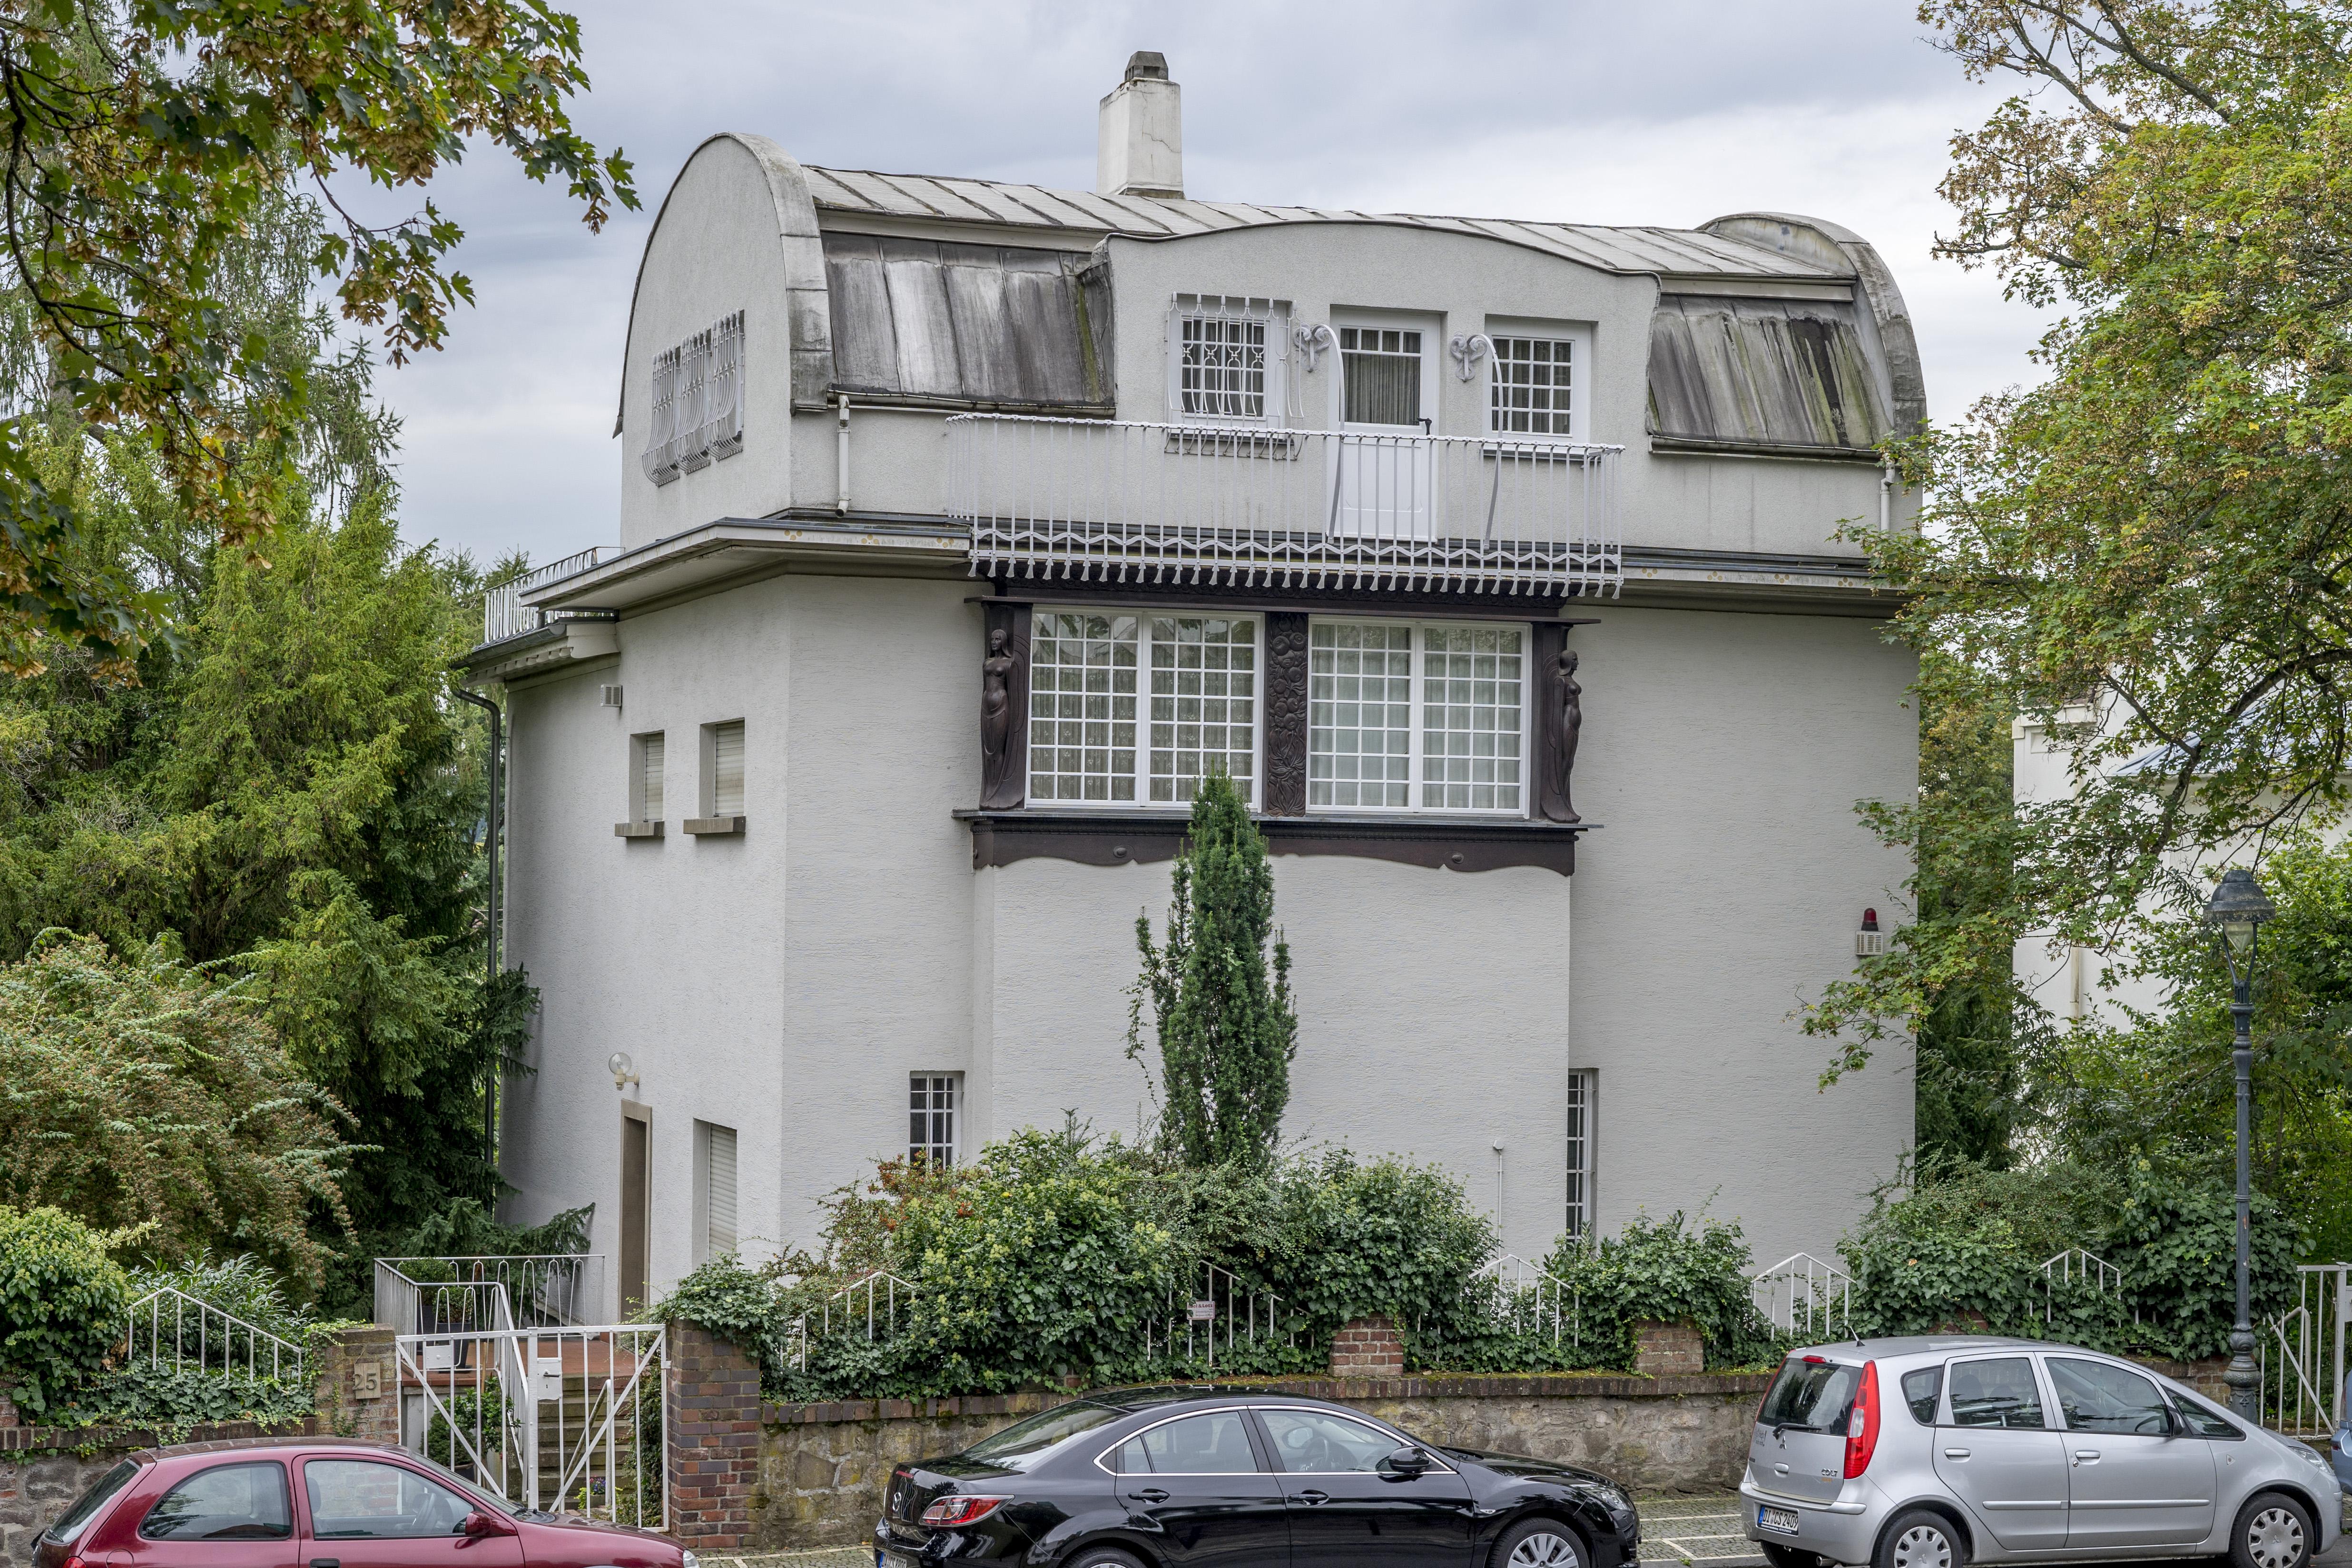 File:Kleines Haus Glückert, Darmstadt 1.jpg - Wikimedia Commons